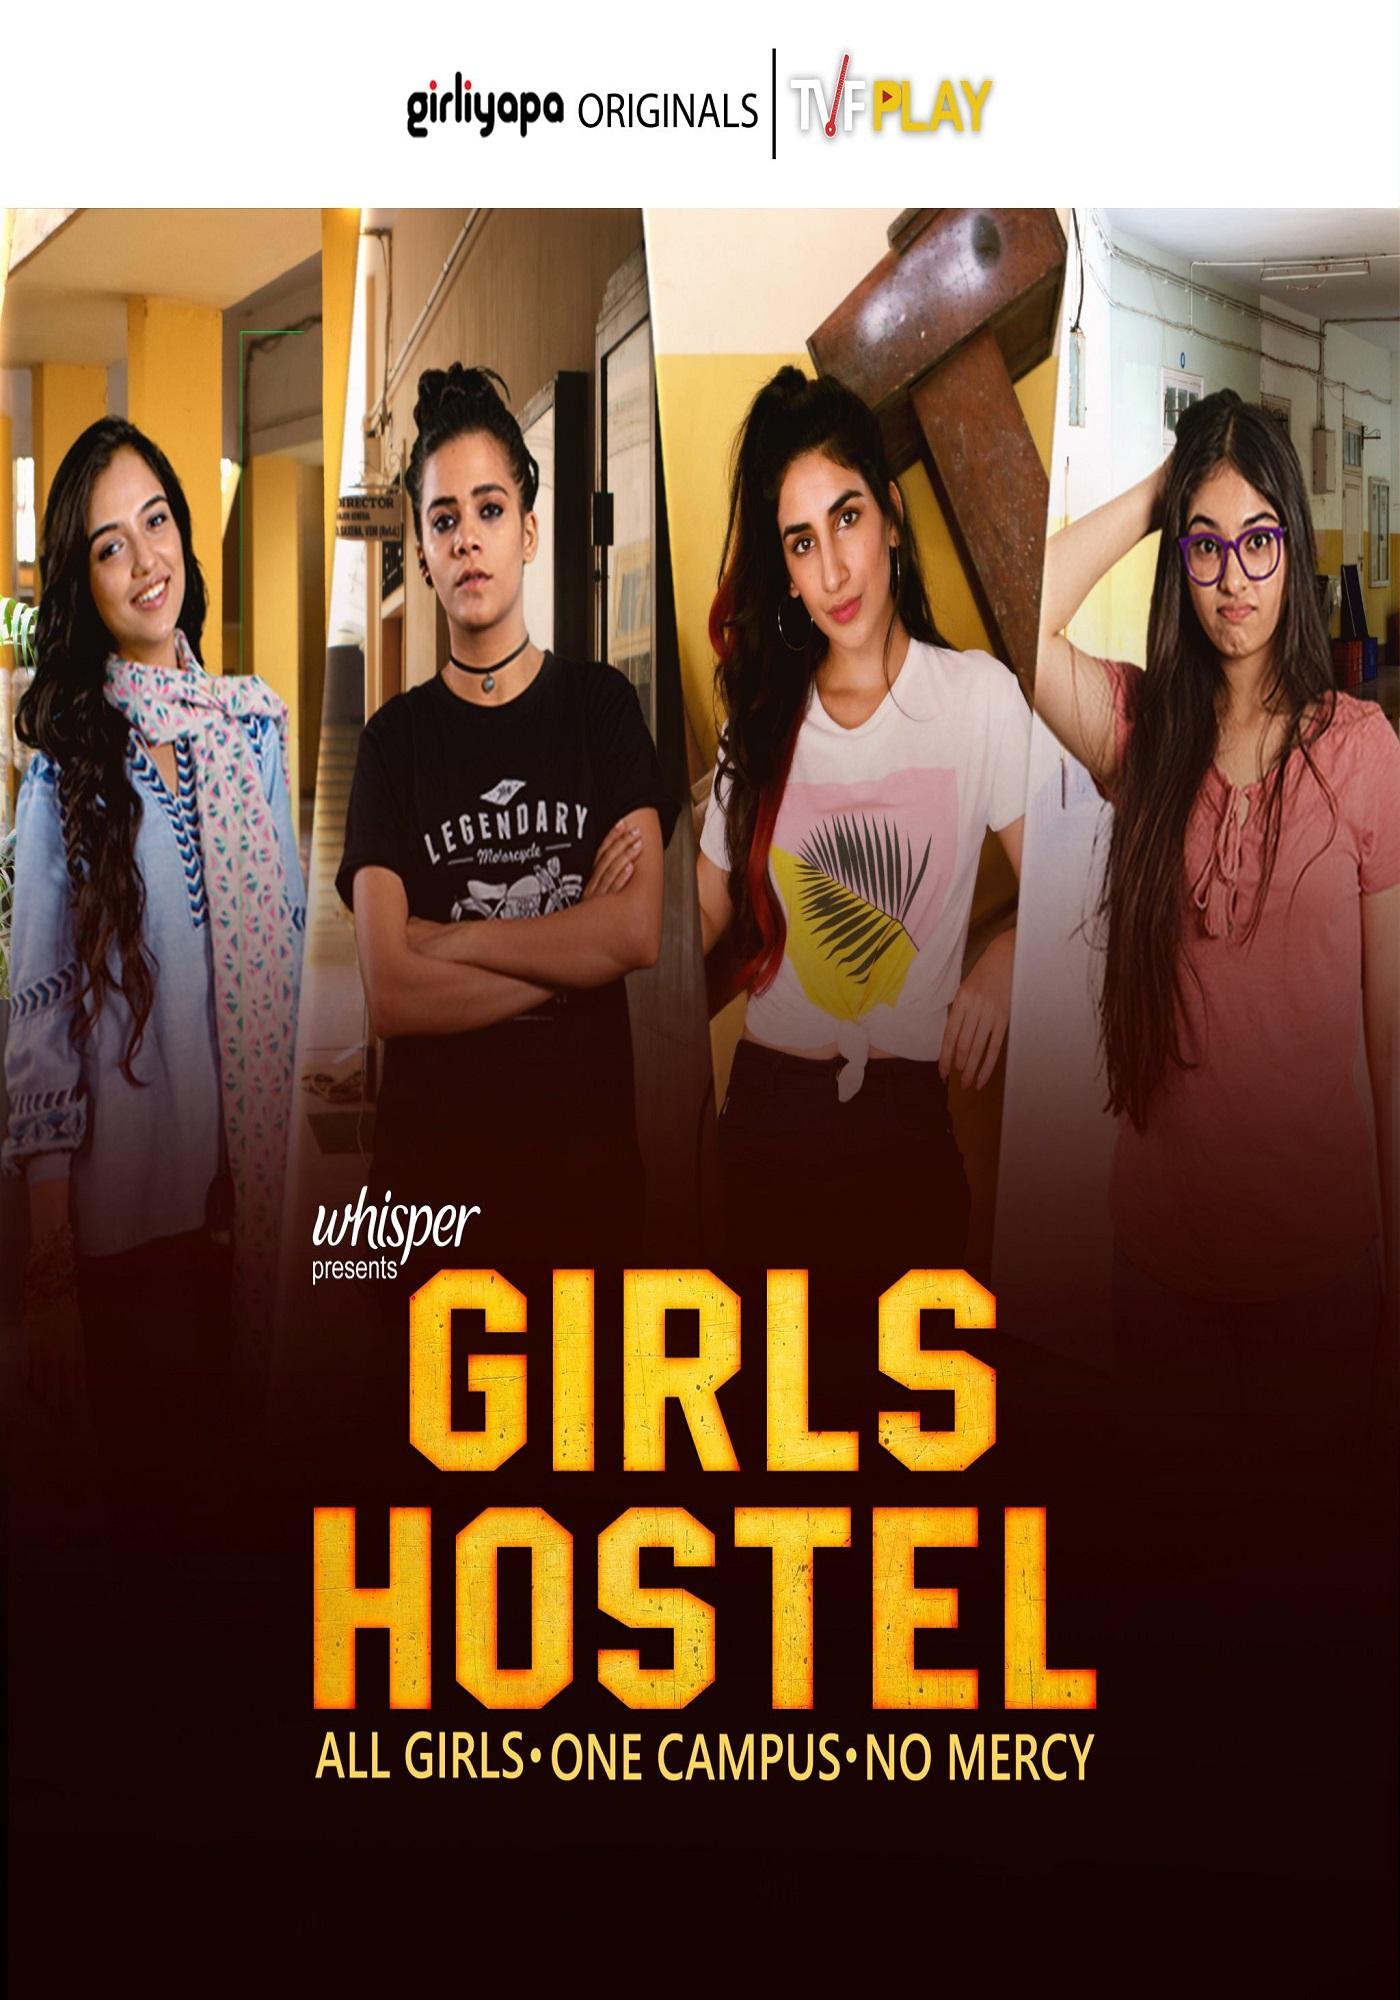 Girls Hostel 2018 S01 Complete TVF Originals Series 1080p WEB-DL Esub